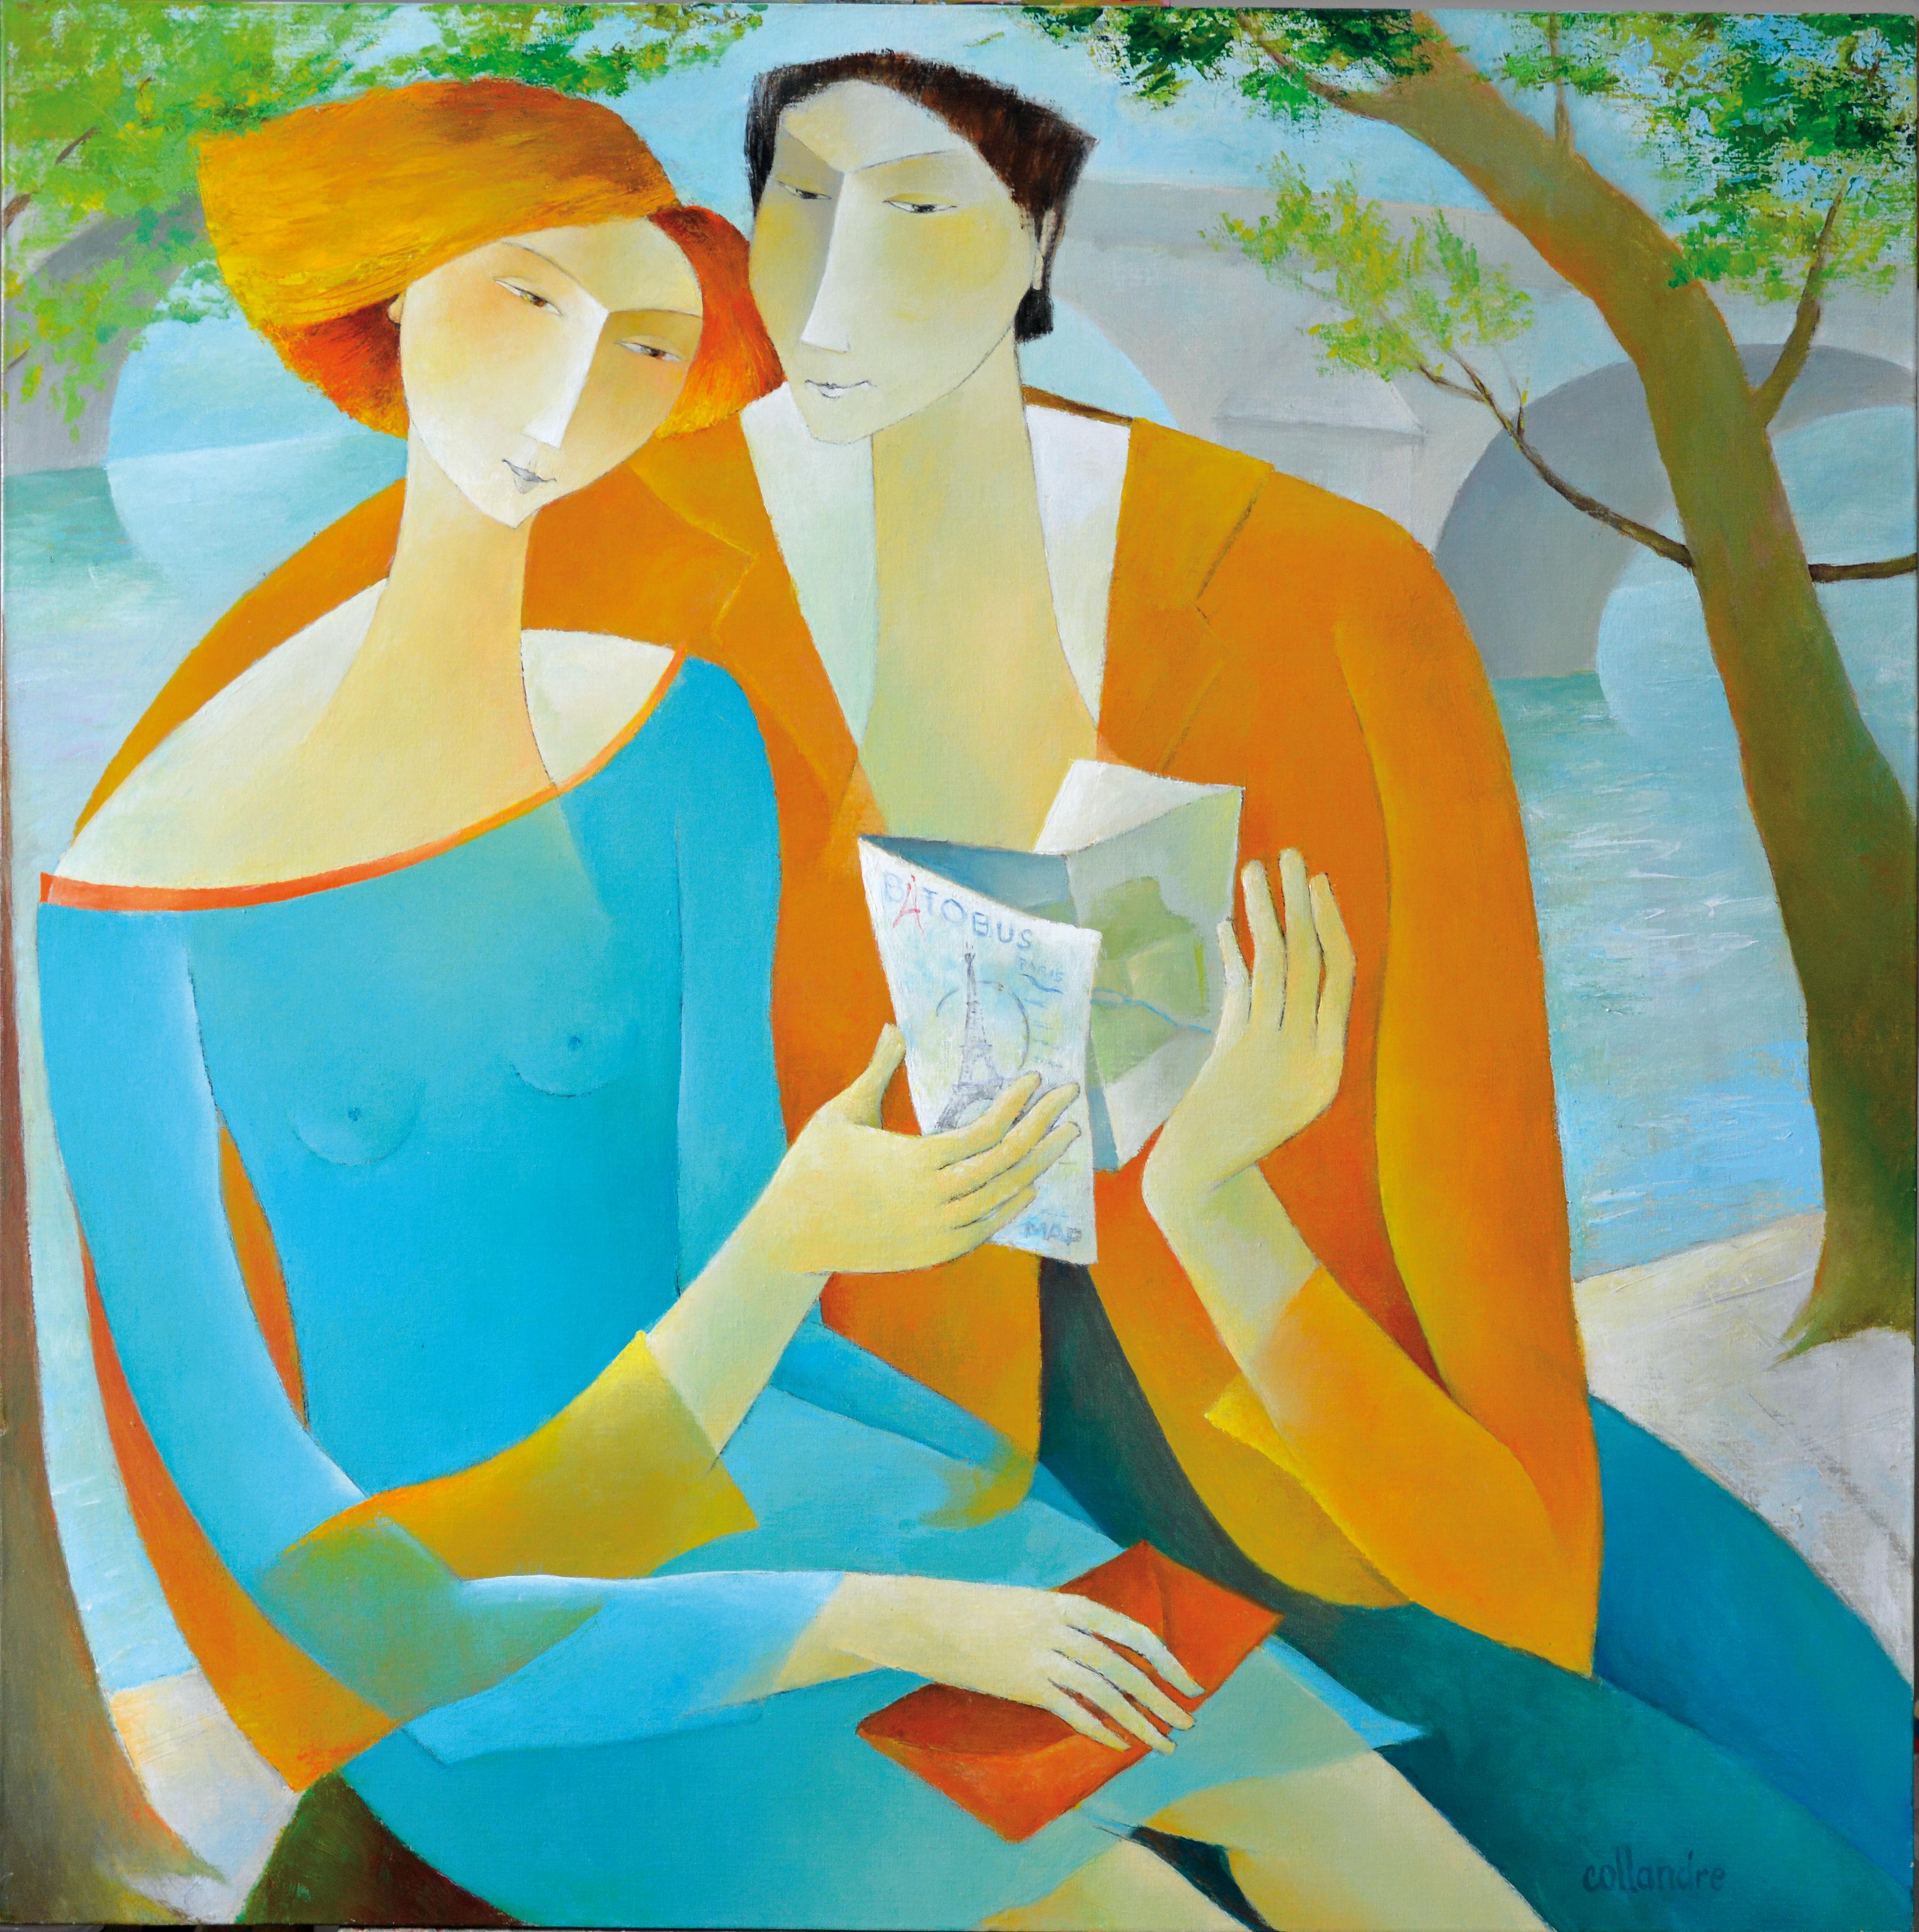 """Banks of Seine"", Paris, Sensual Reading Couple, Blue Orange Figurative Painting"